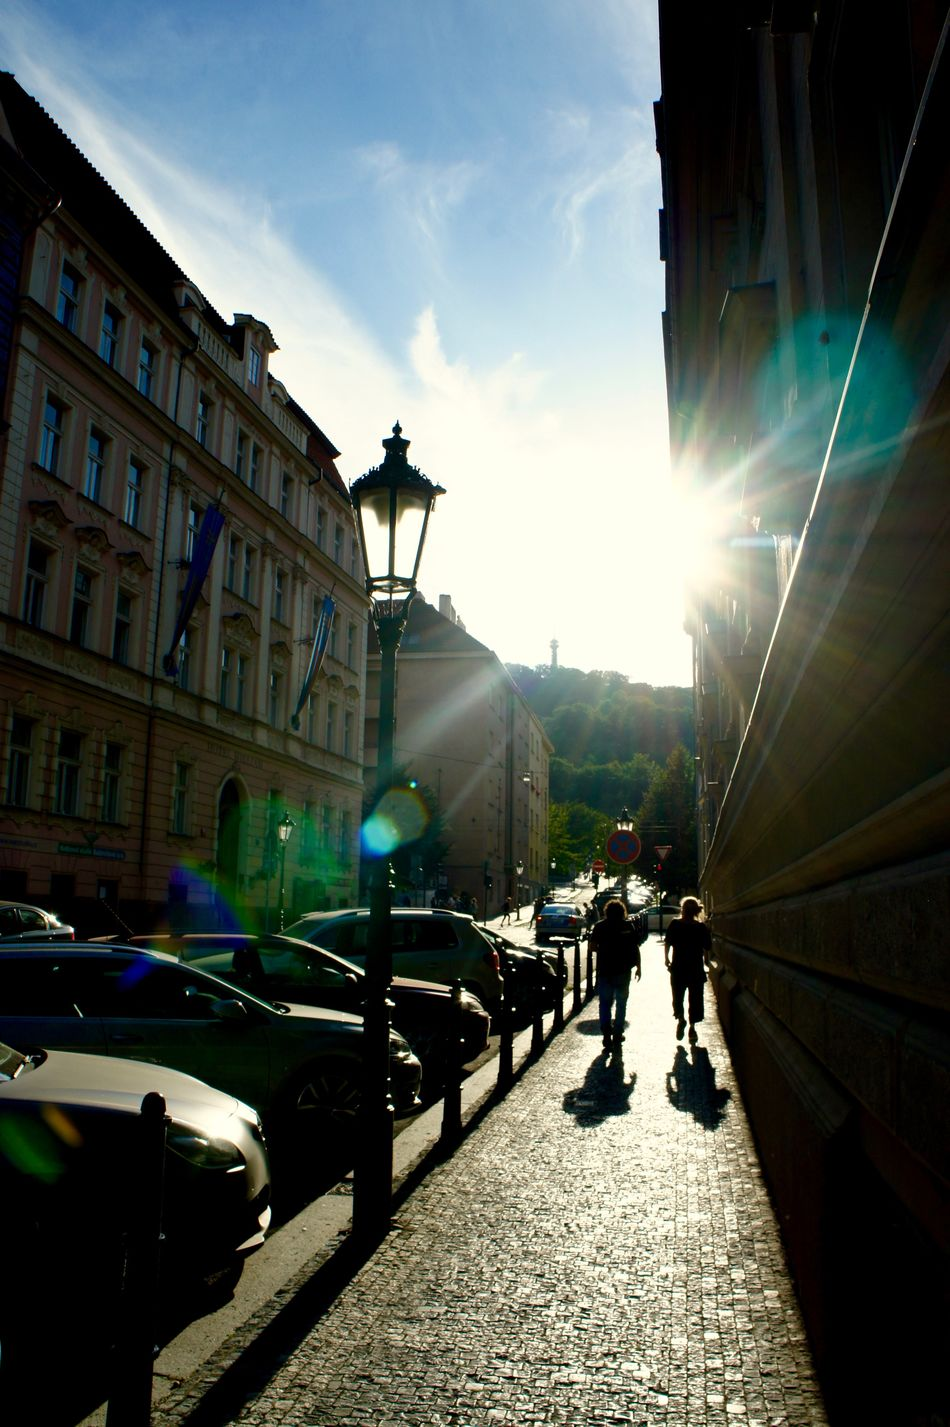 #Afternoon #City #city Life #late Summer #Prague #side Alleys #sun #urban